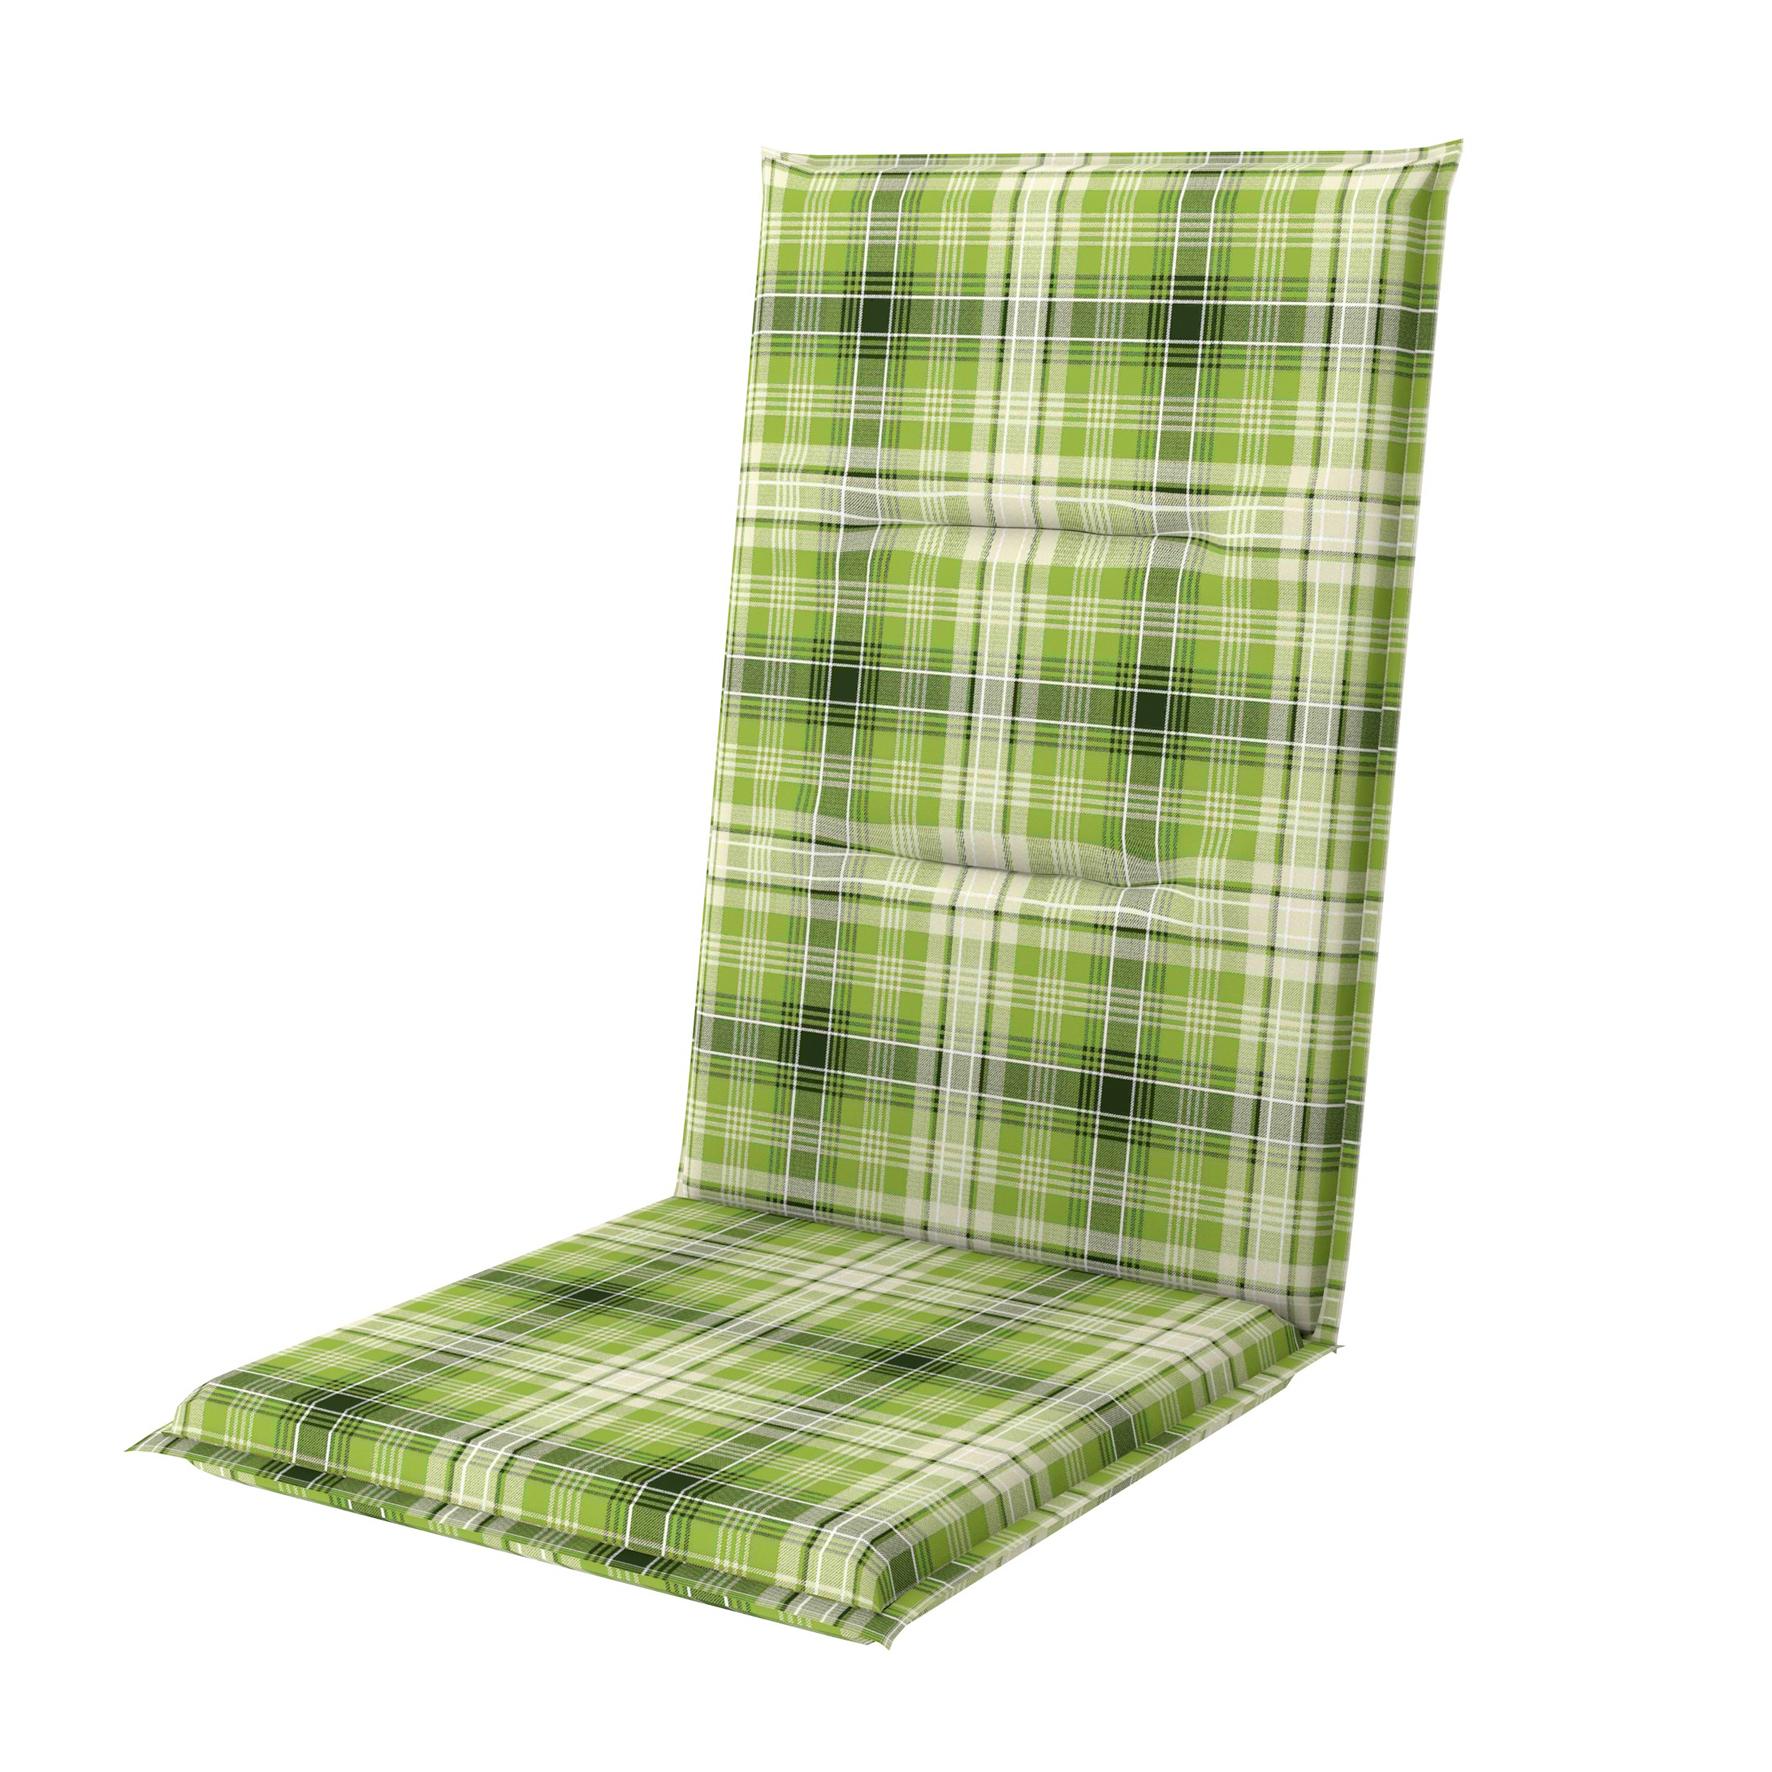 SPOT 5900 vysoký - polstr na židli a křeslo